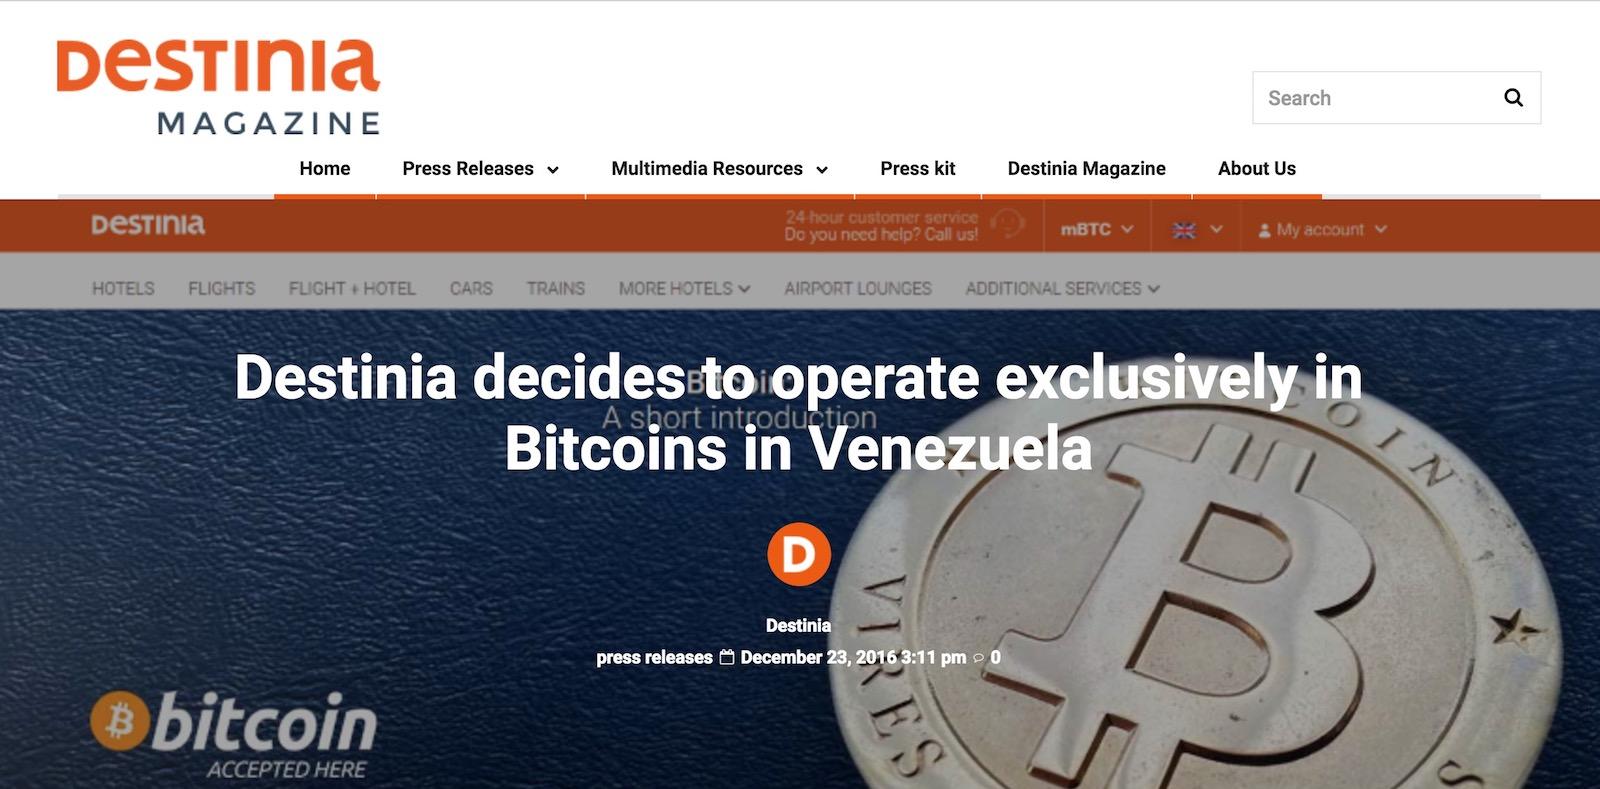 Destinia akzeptiert Bitcoins